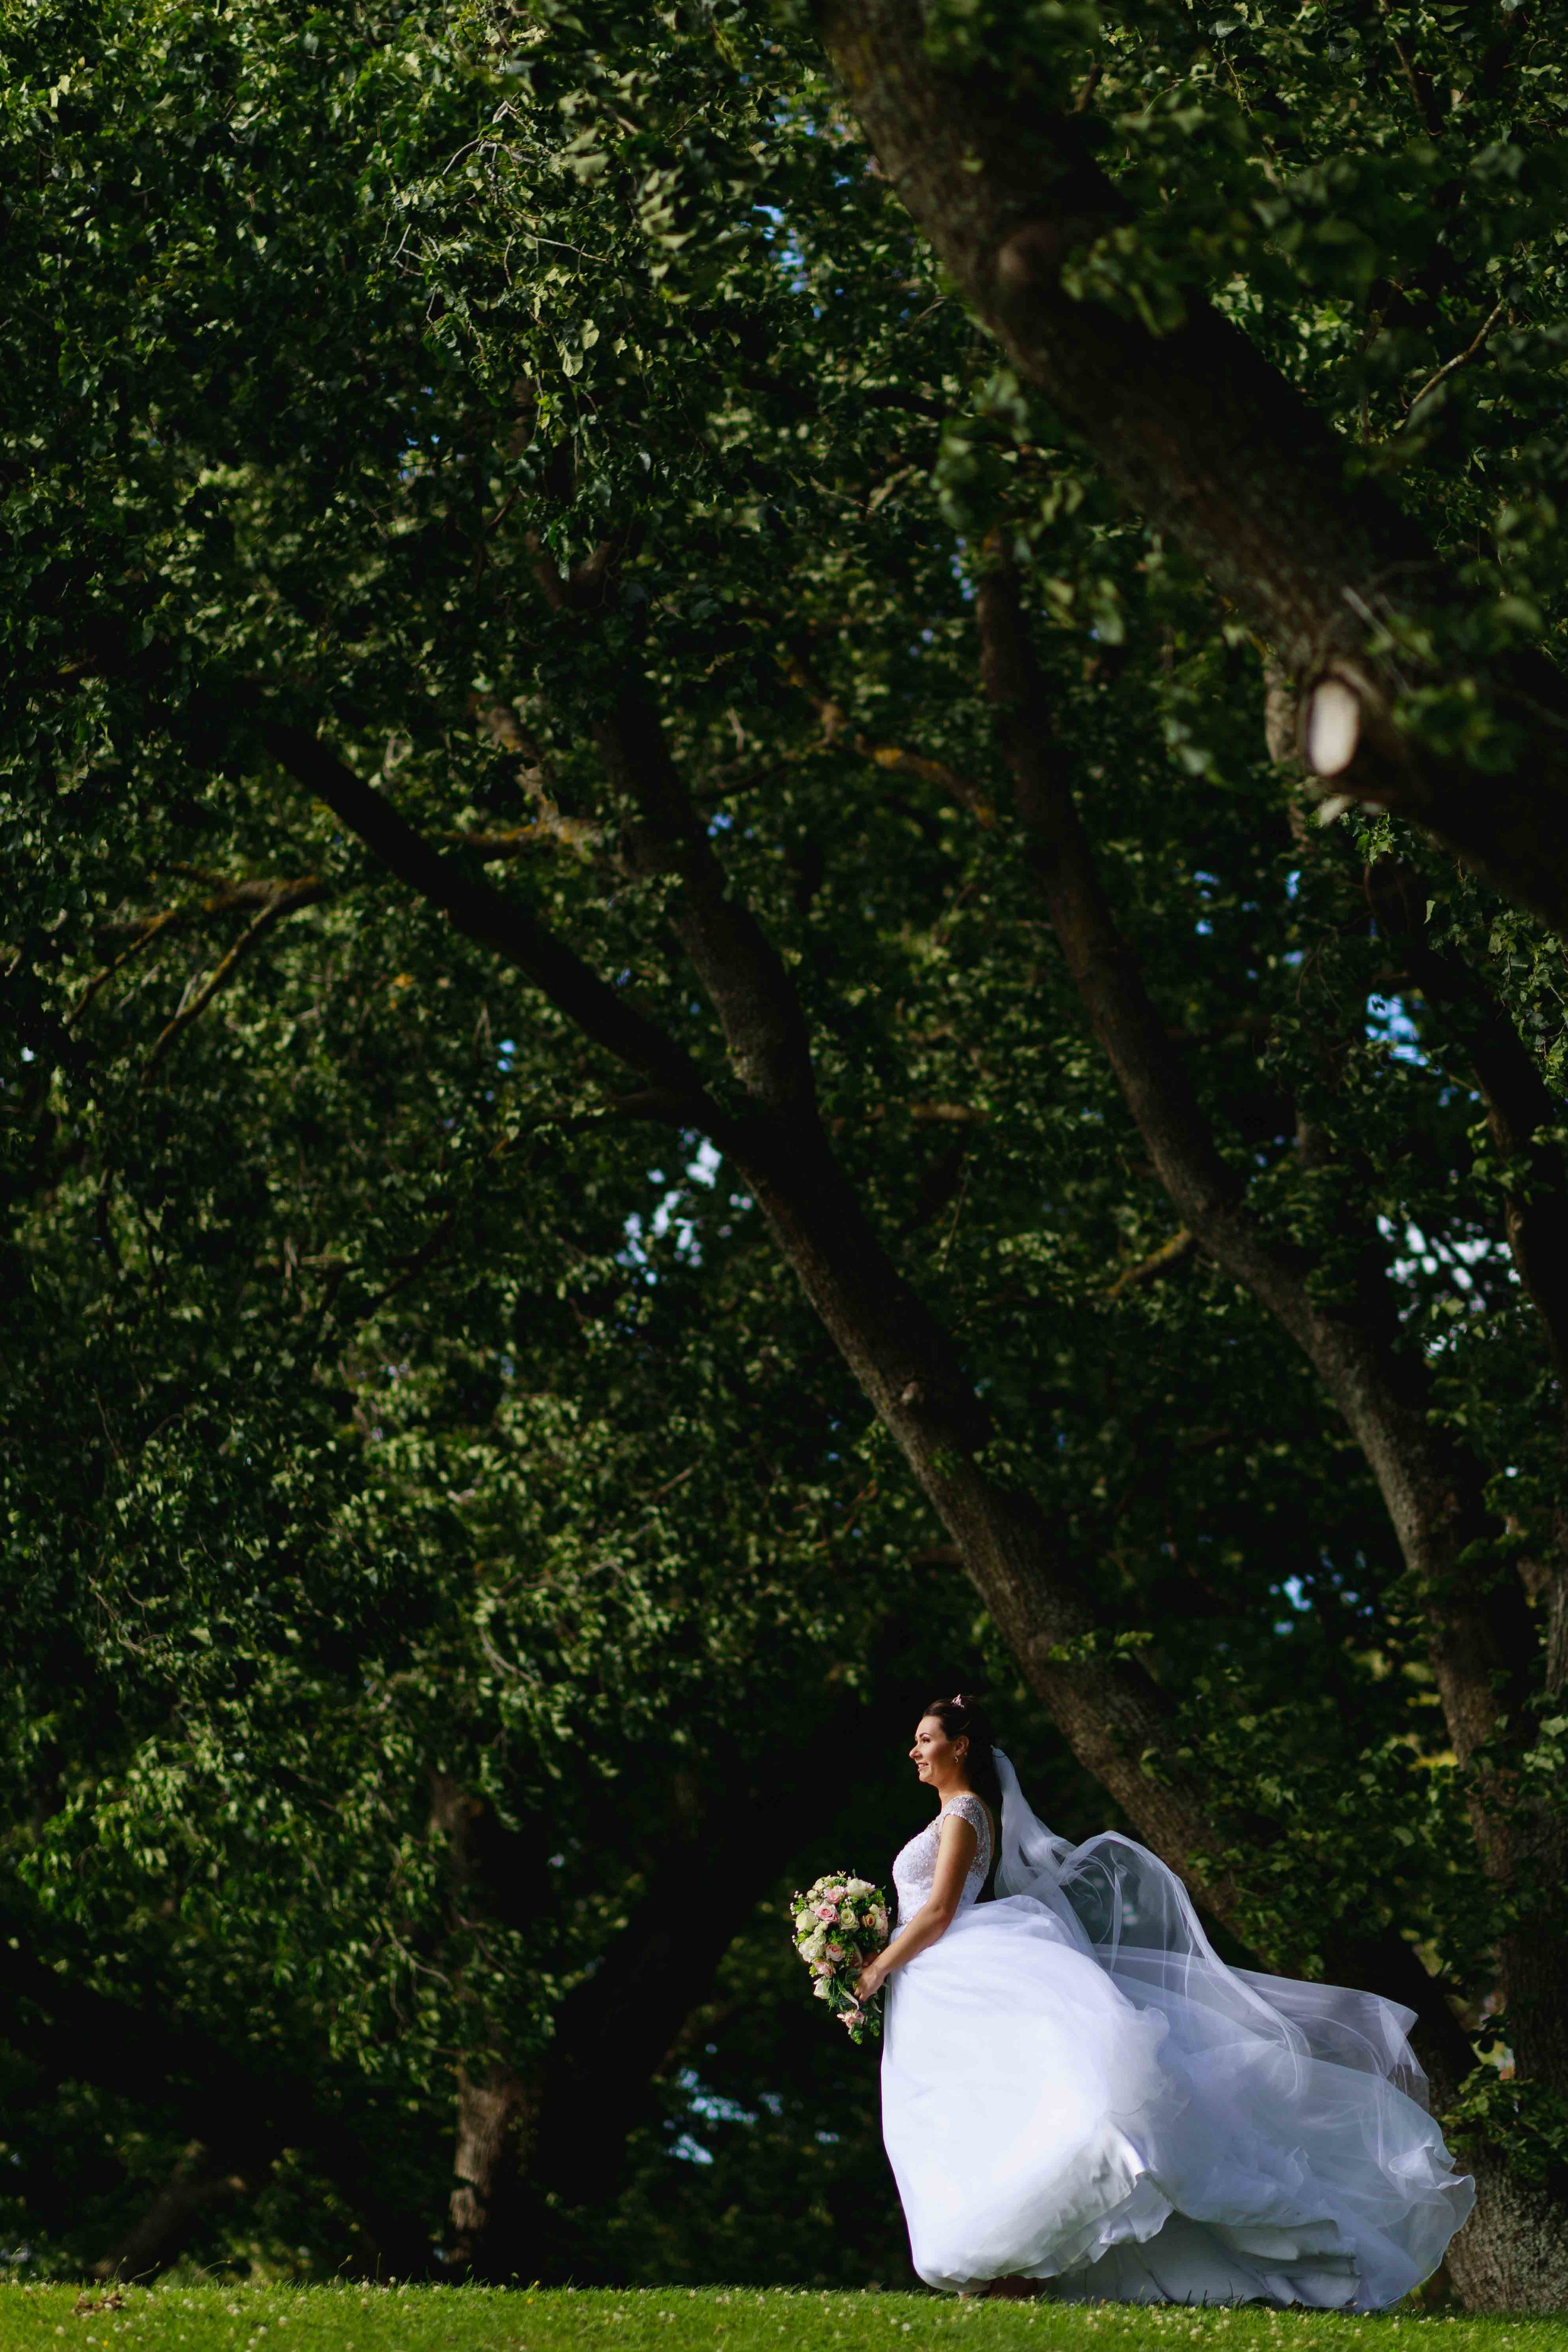 the-chalet-highlight-wedding-photography-palmerston-north-157.jpg